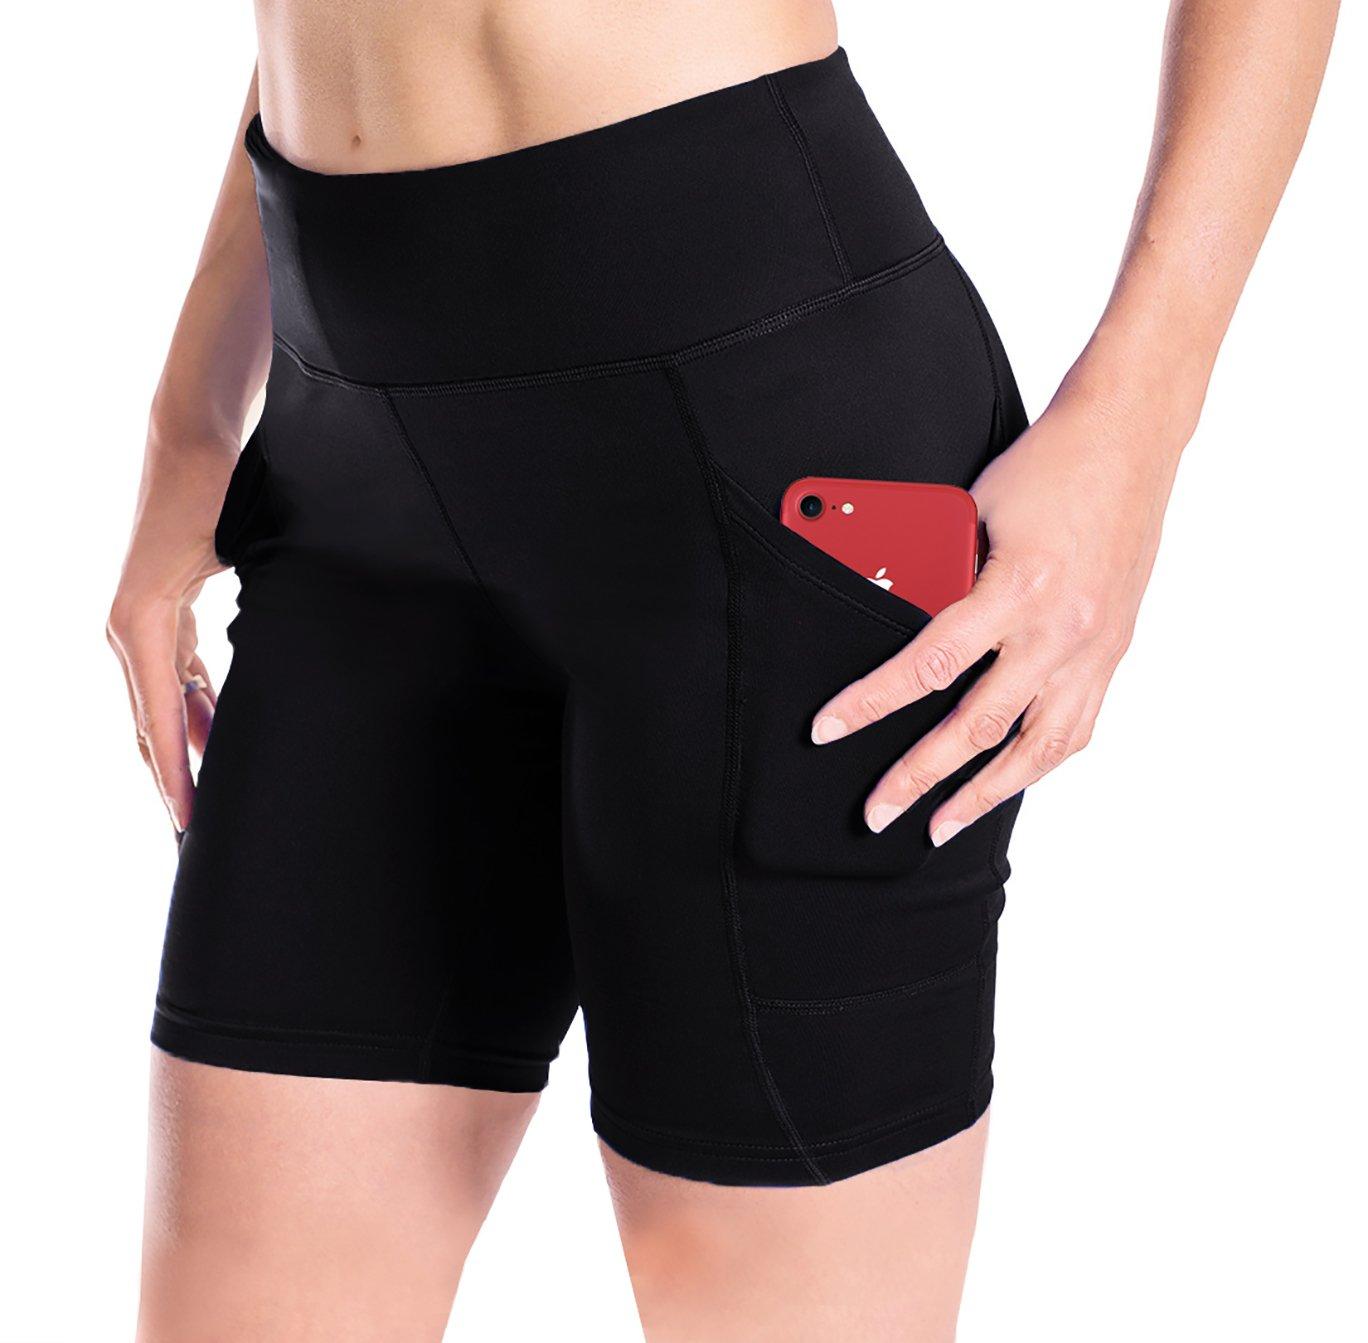 Yogipace Women's 7'' Inseam Compression Workout Shorts Bike Short Side Pockets Black Size XS